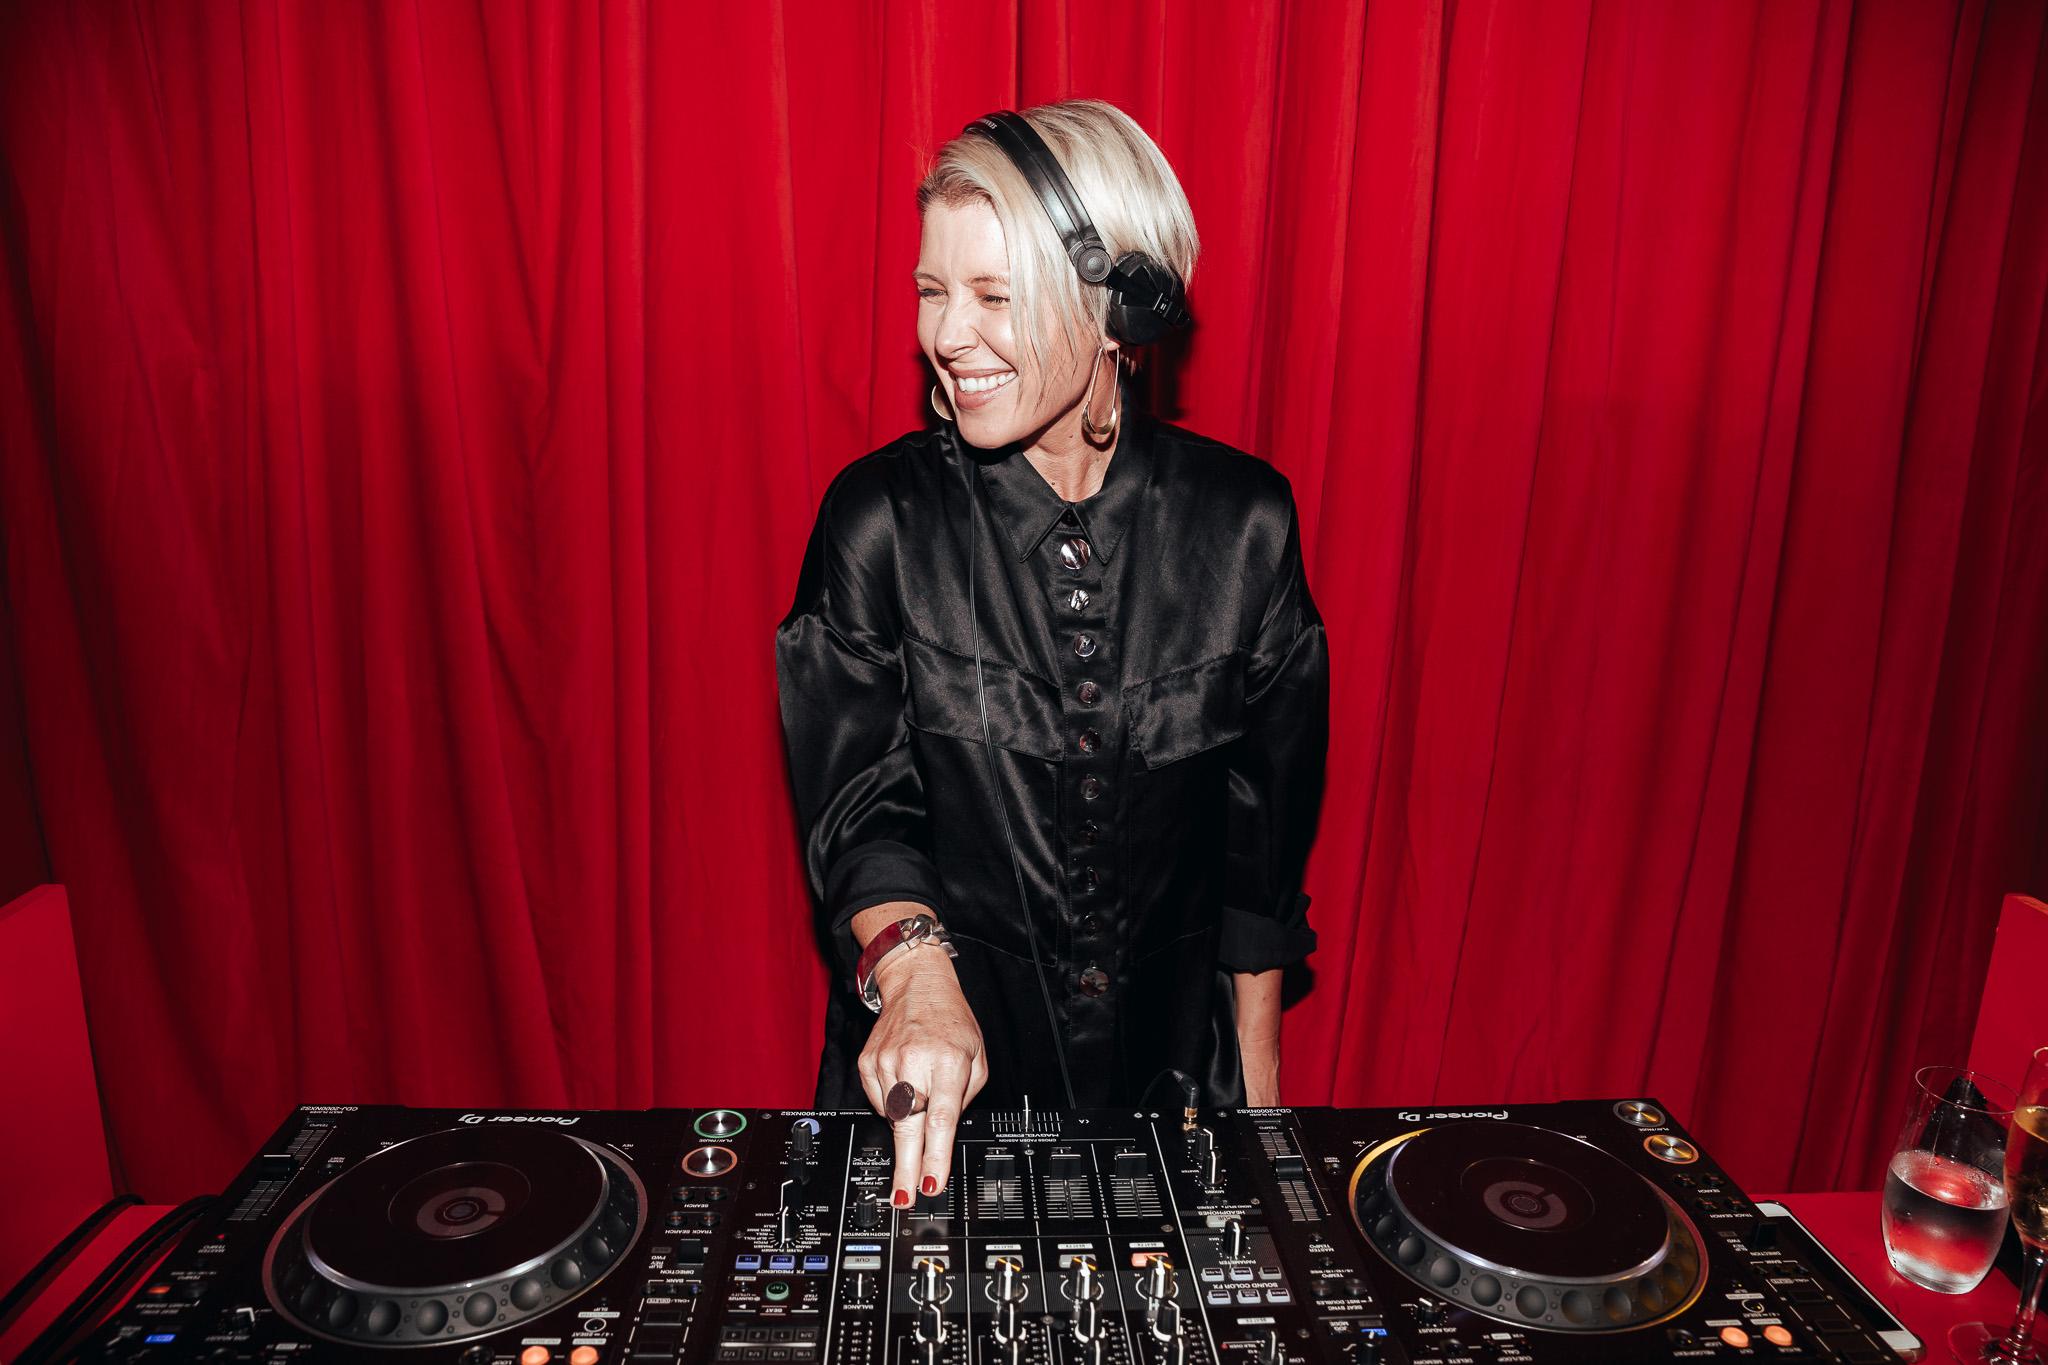 DJ Niki de Saint x Christian Louboutin .jpg